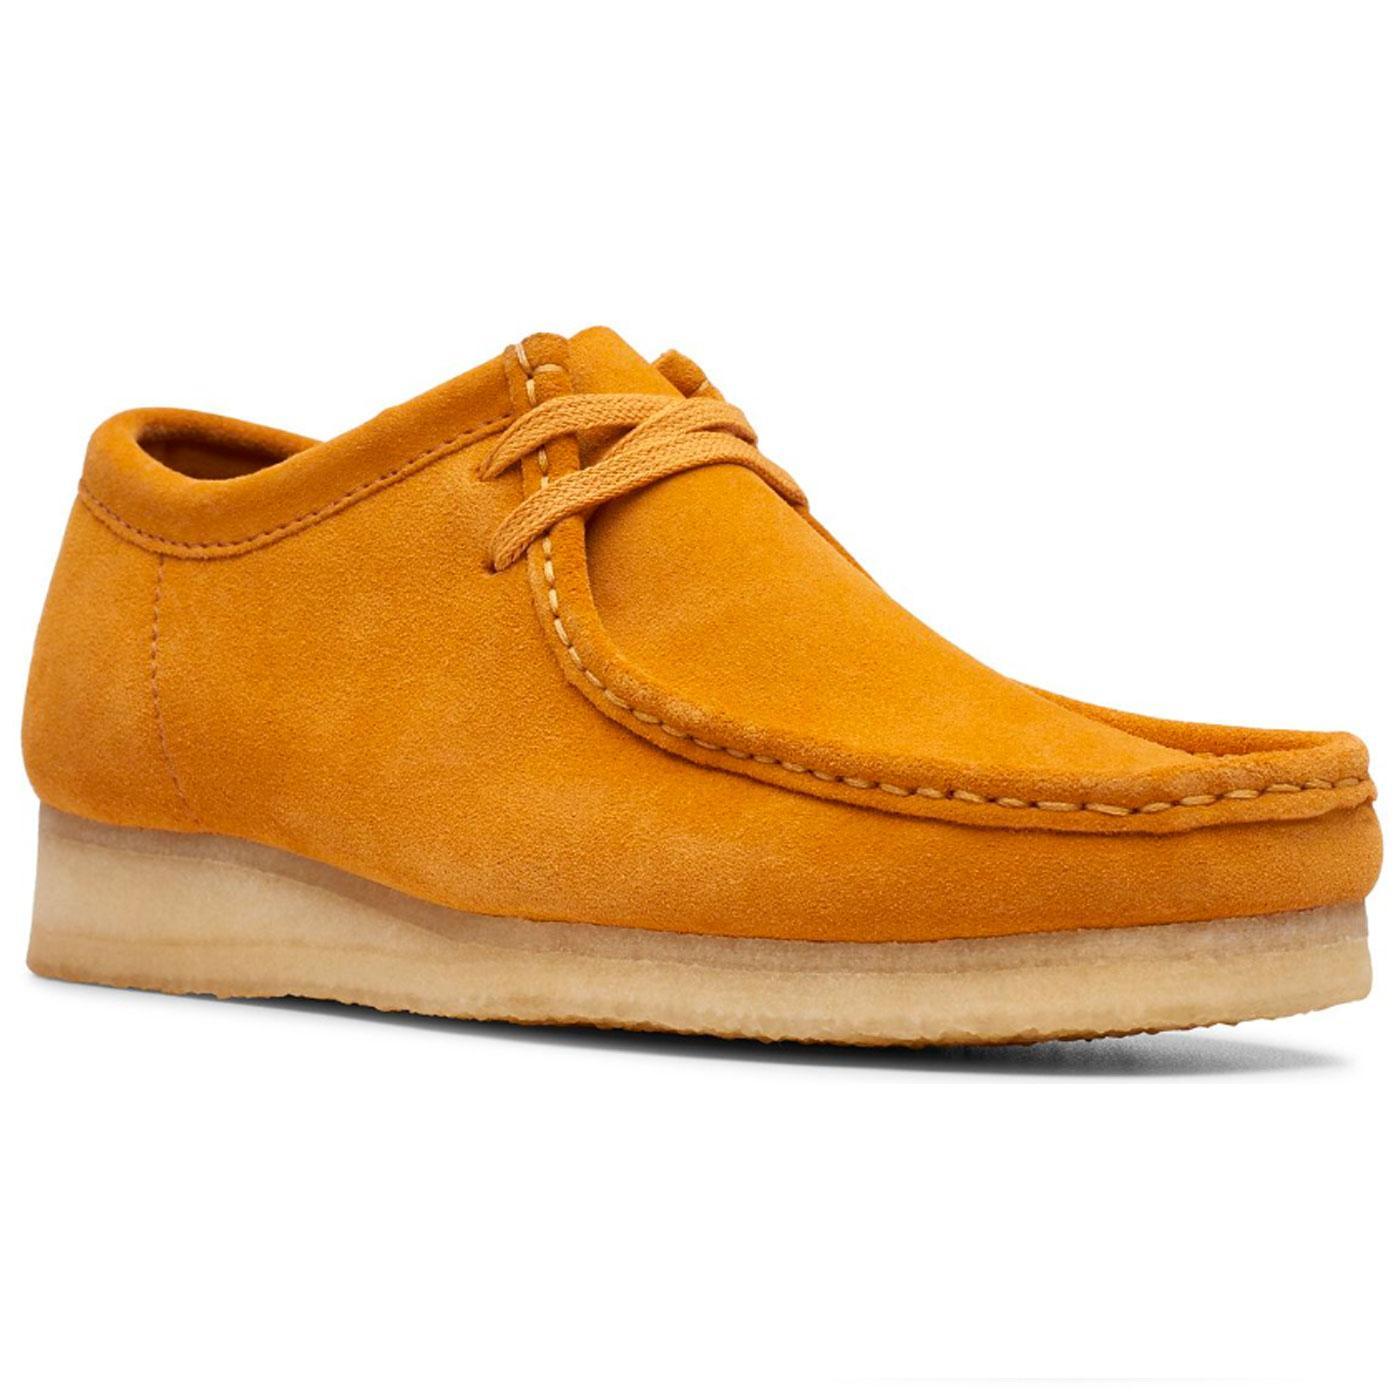 Wallabee Women's CLARKS ORIGINALS Suede Shoes (T)